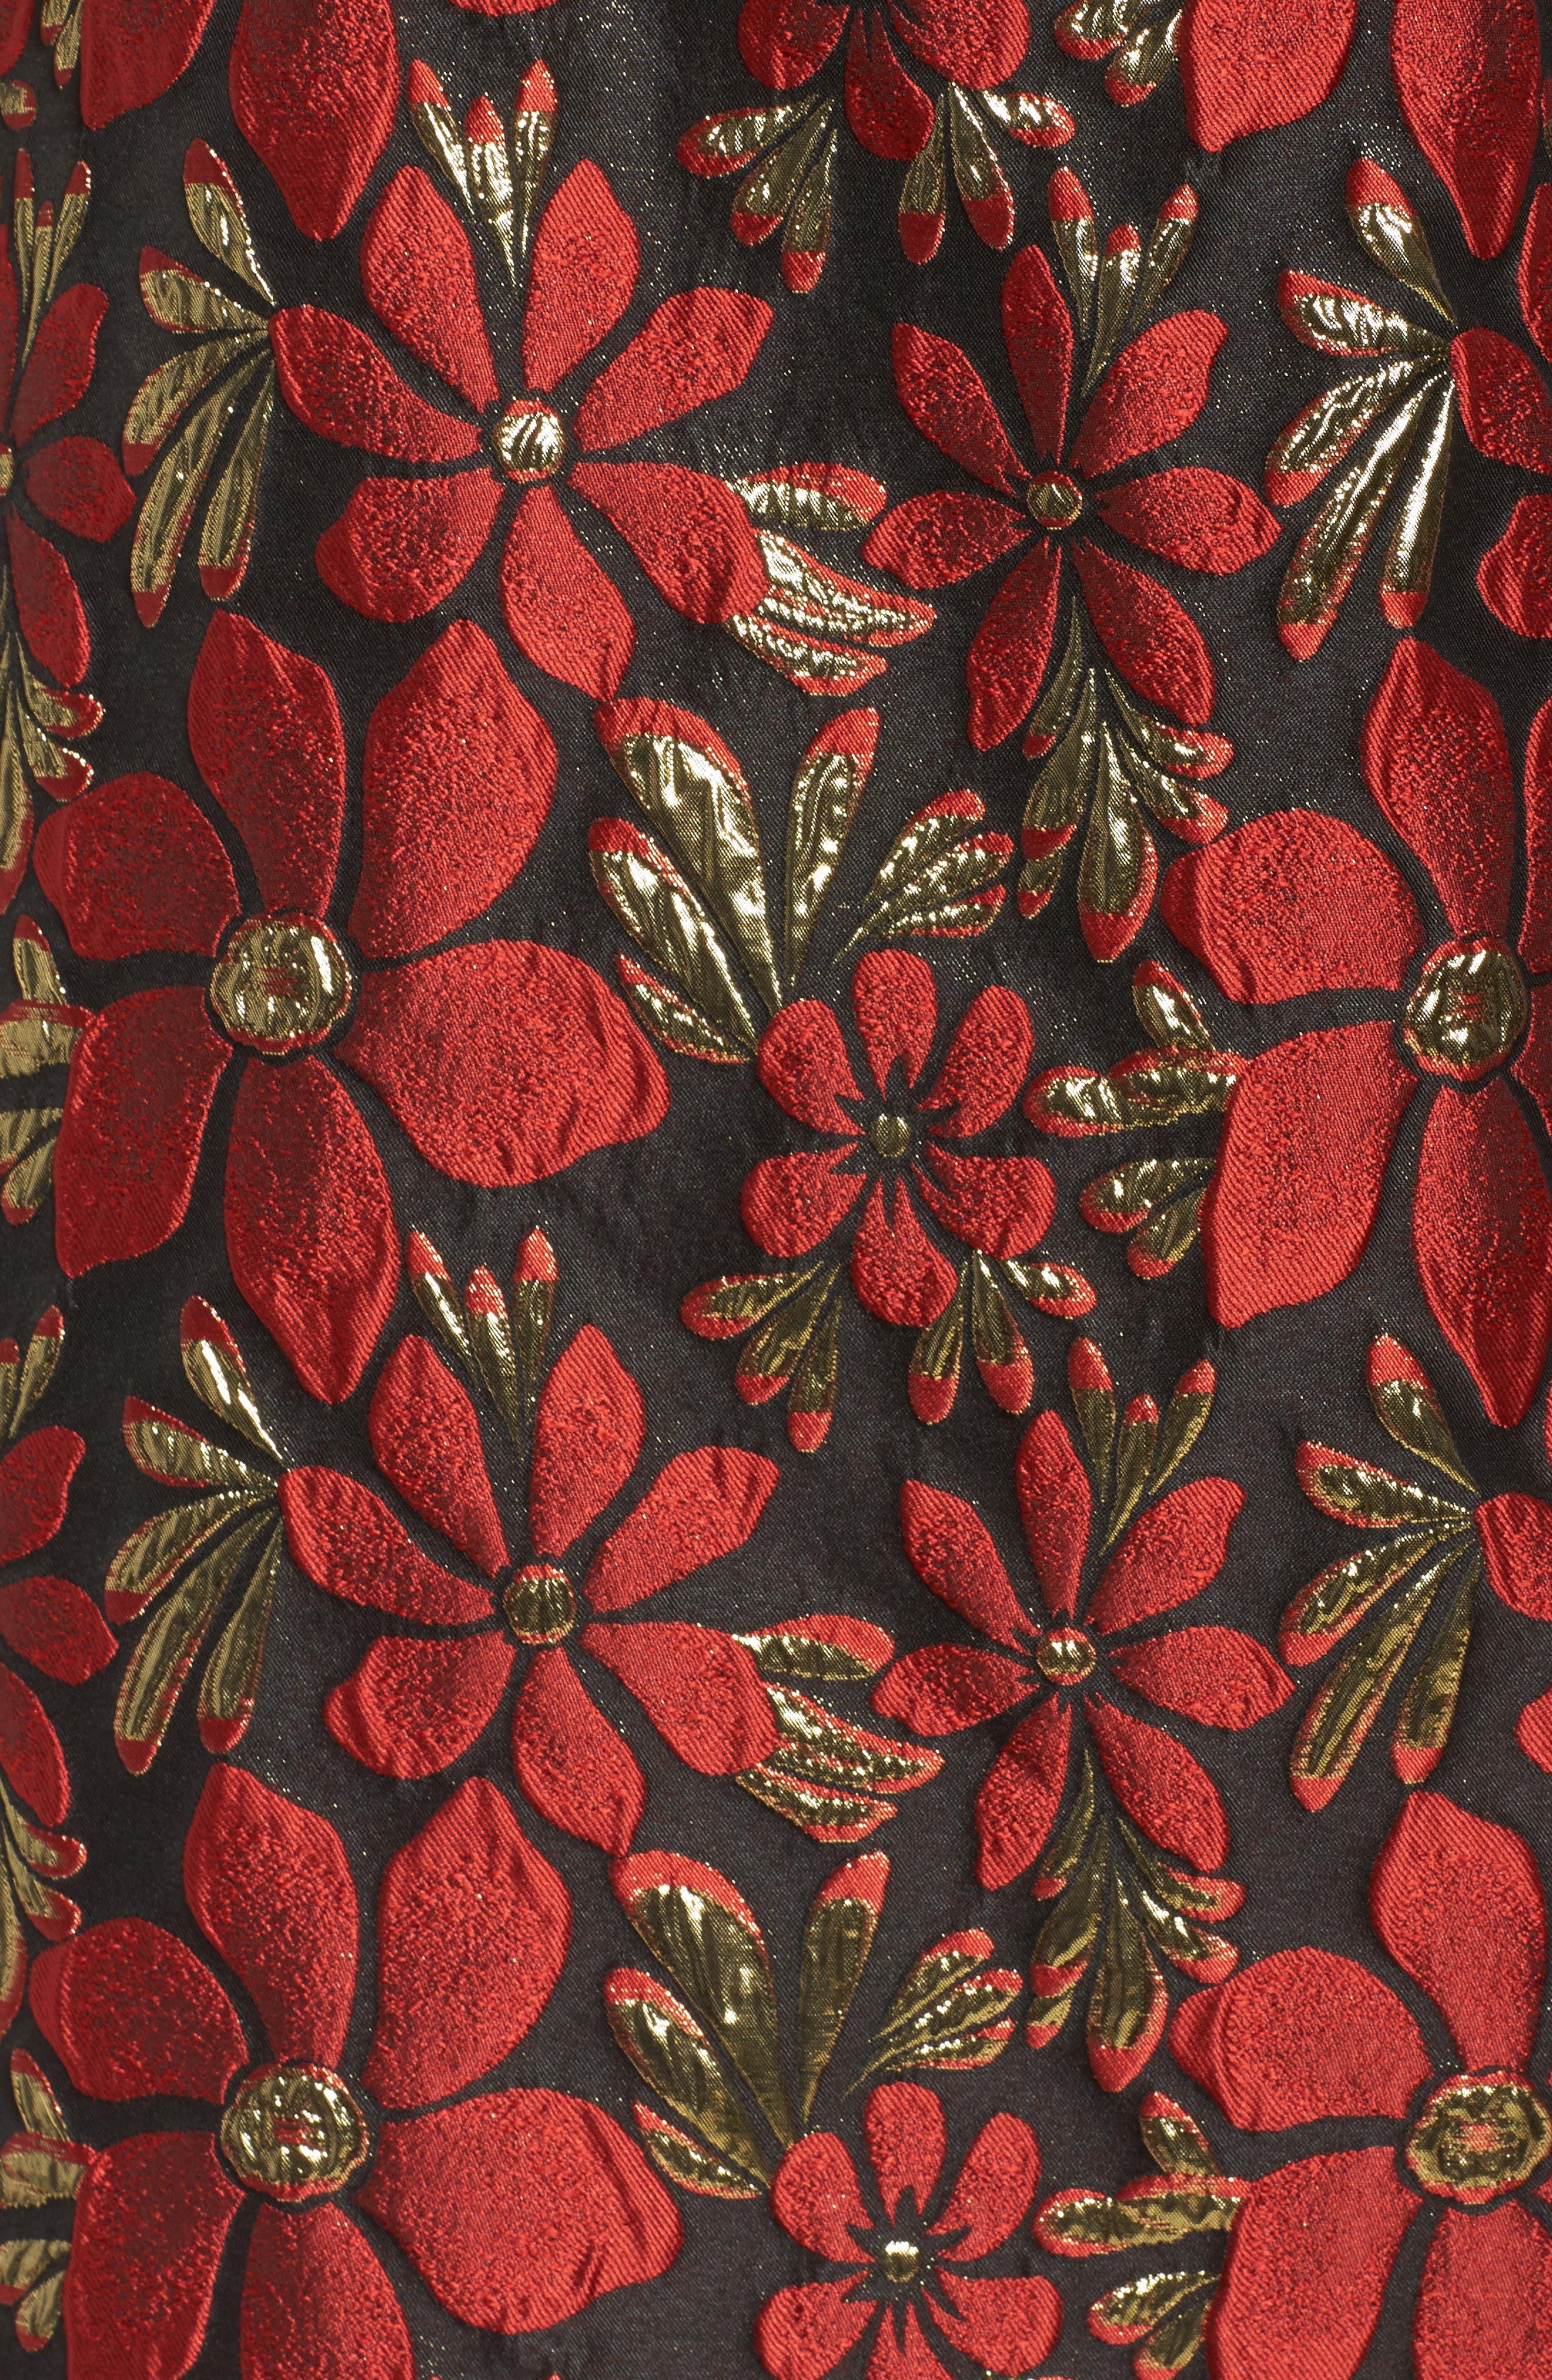 Sleeveless Jacquard Fit & Flare Dress,                             Alternate thumbnail 5, color,                             Black/ Red/ Gold